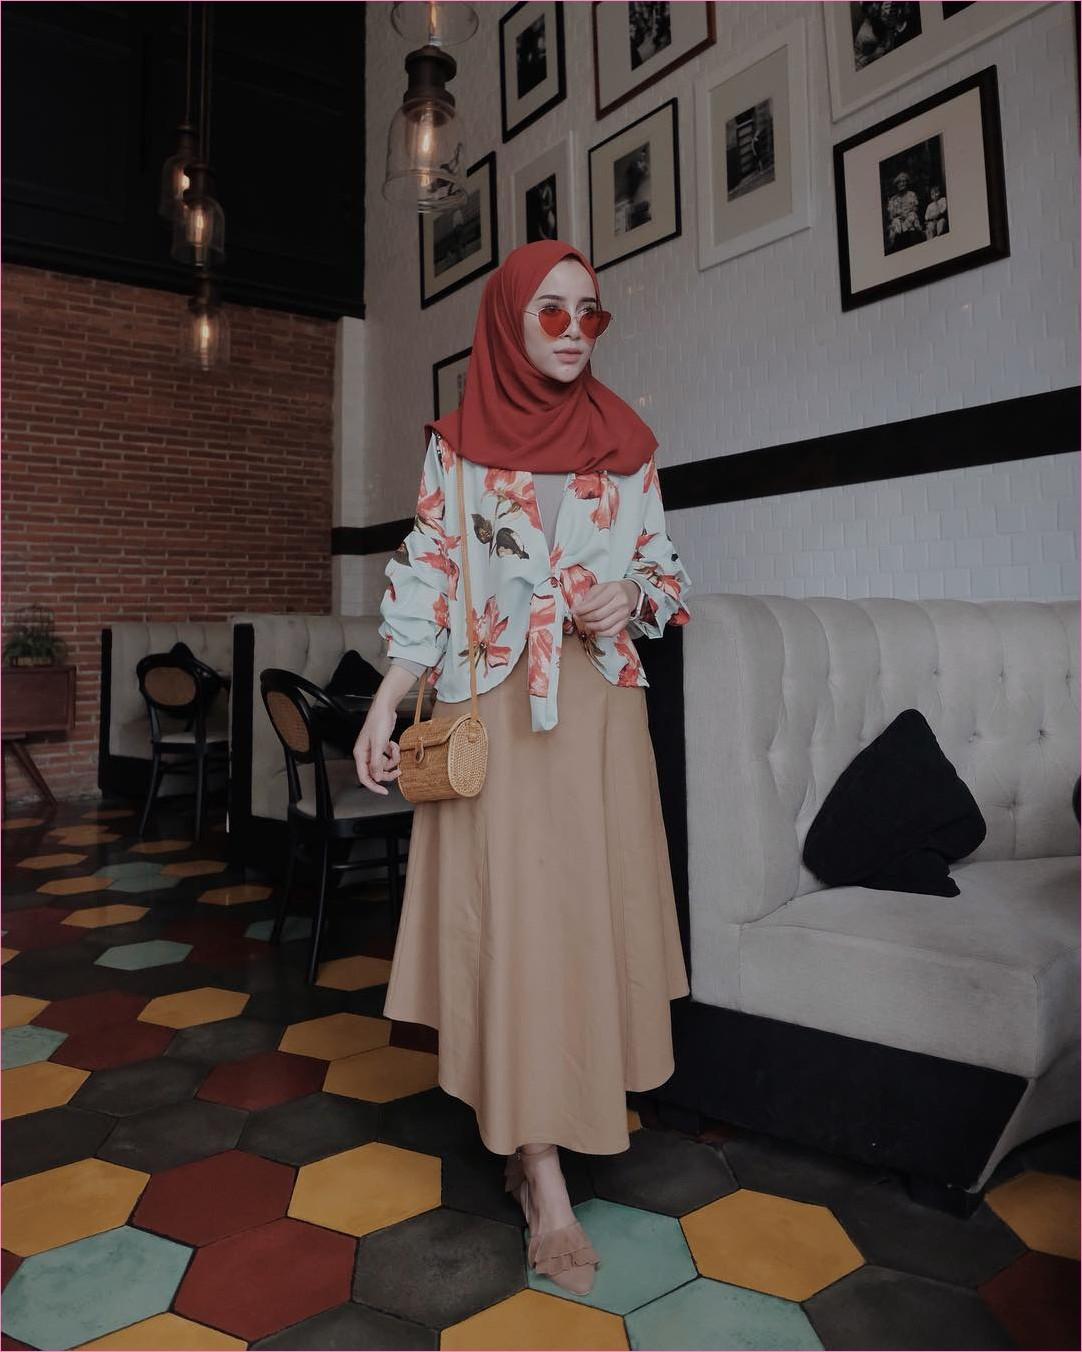 Outfit Rok Untuk Hijabers Ala Selebgram 2018 loafers and slip ons sandals krem top blouse hijau pastel hijab pashmina diamond kacamata bulat oren tua mangset abu slingbags rotan coklat rok A-line krem ootd trendy